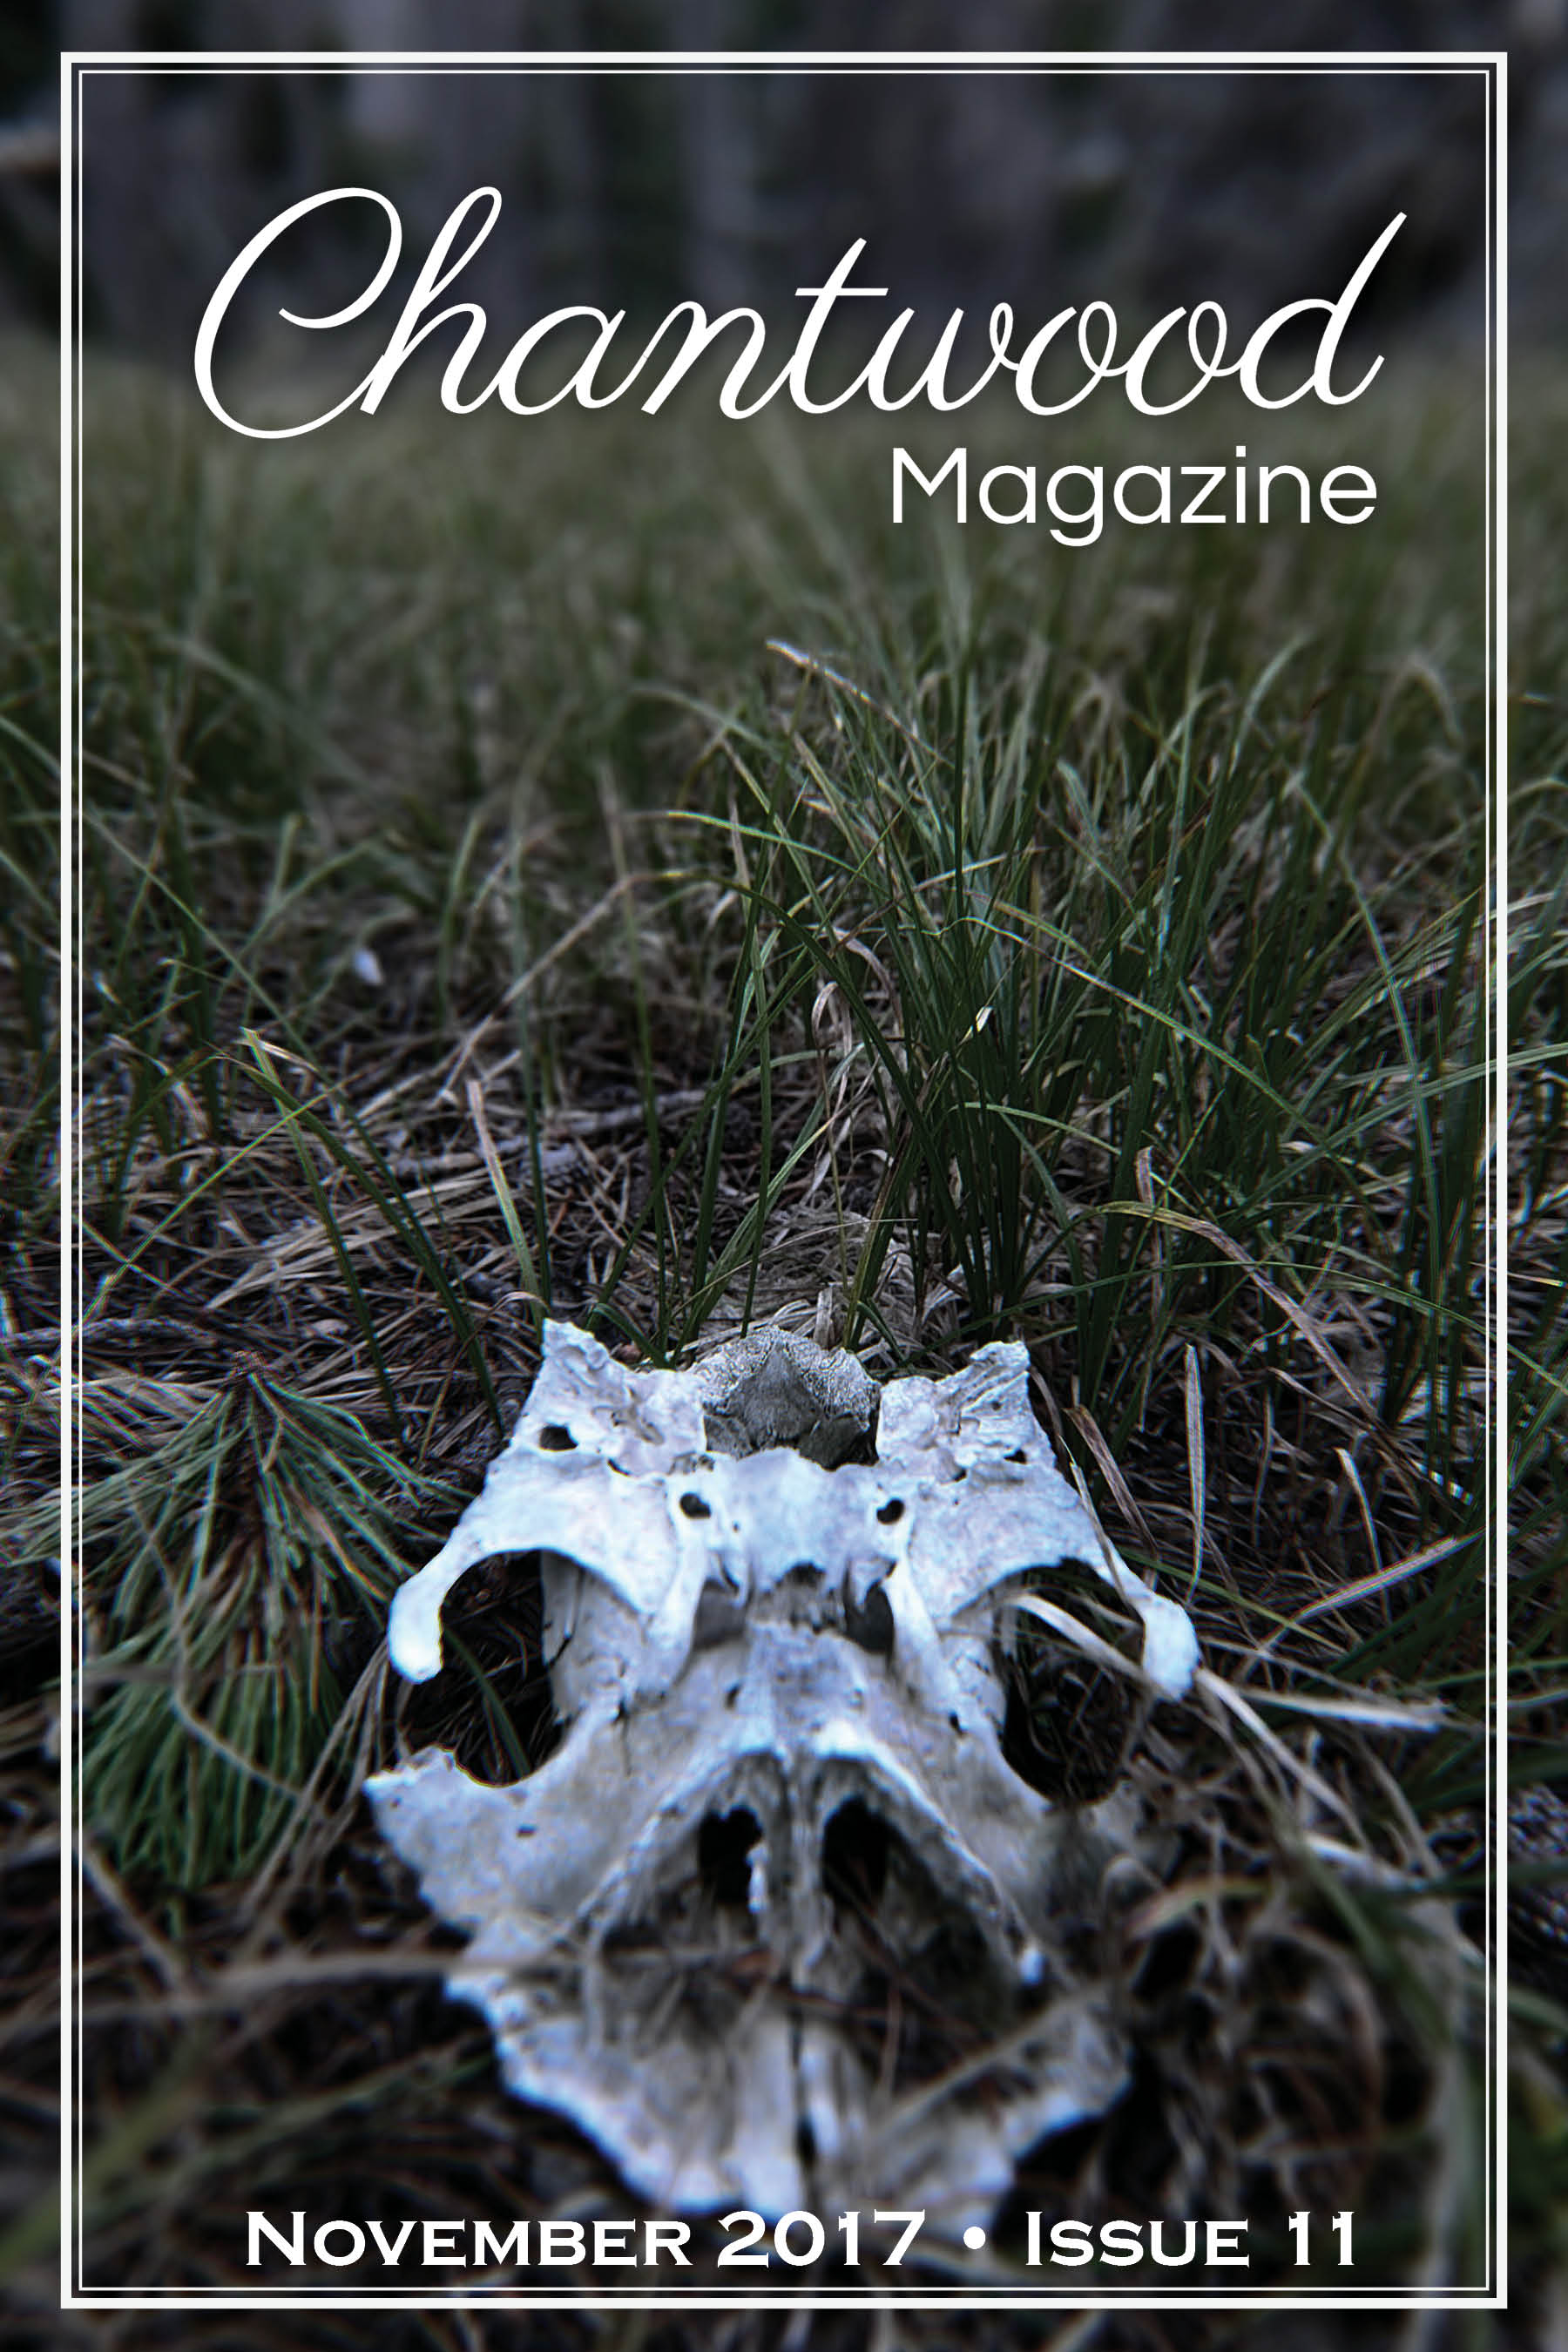 chantwood cover november 2017.jpg